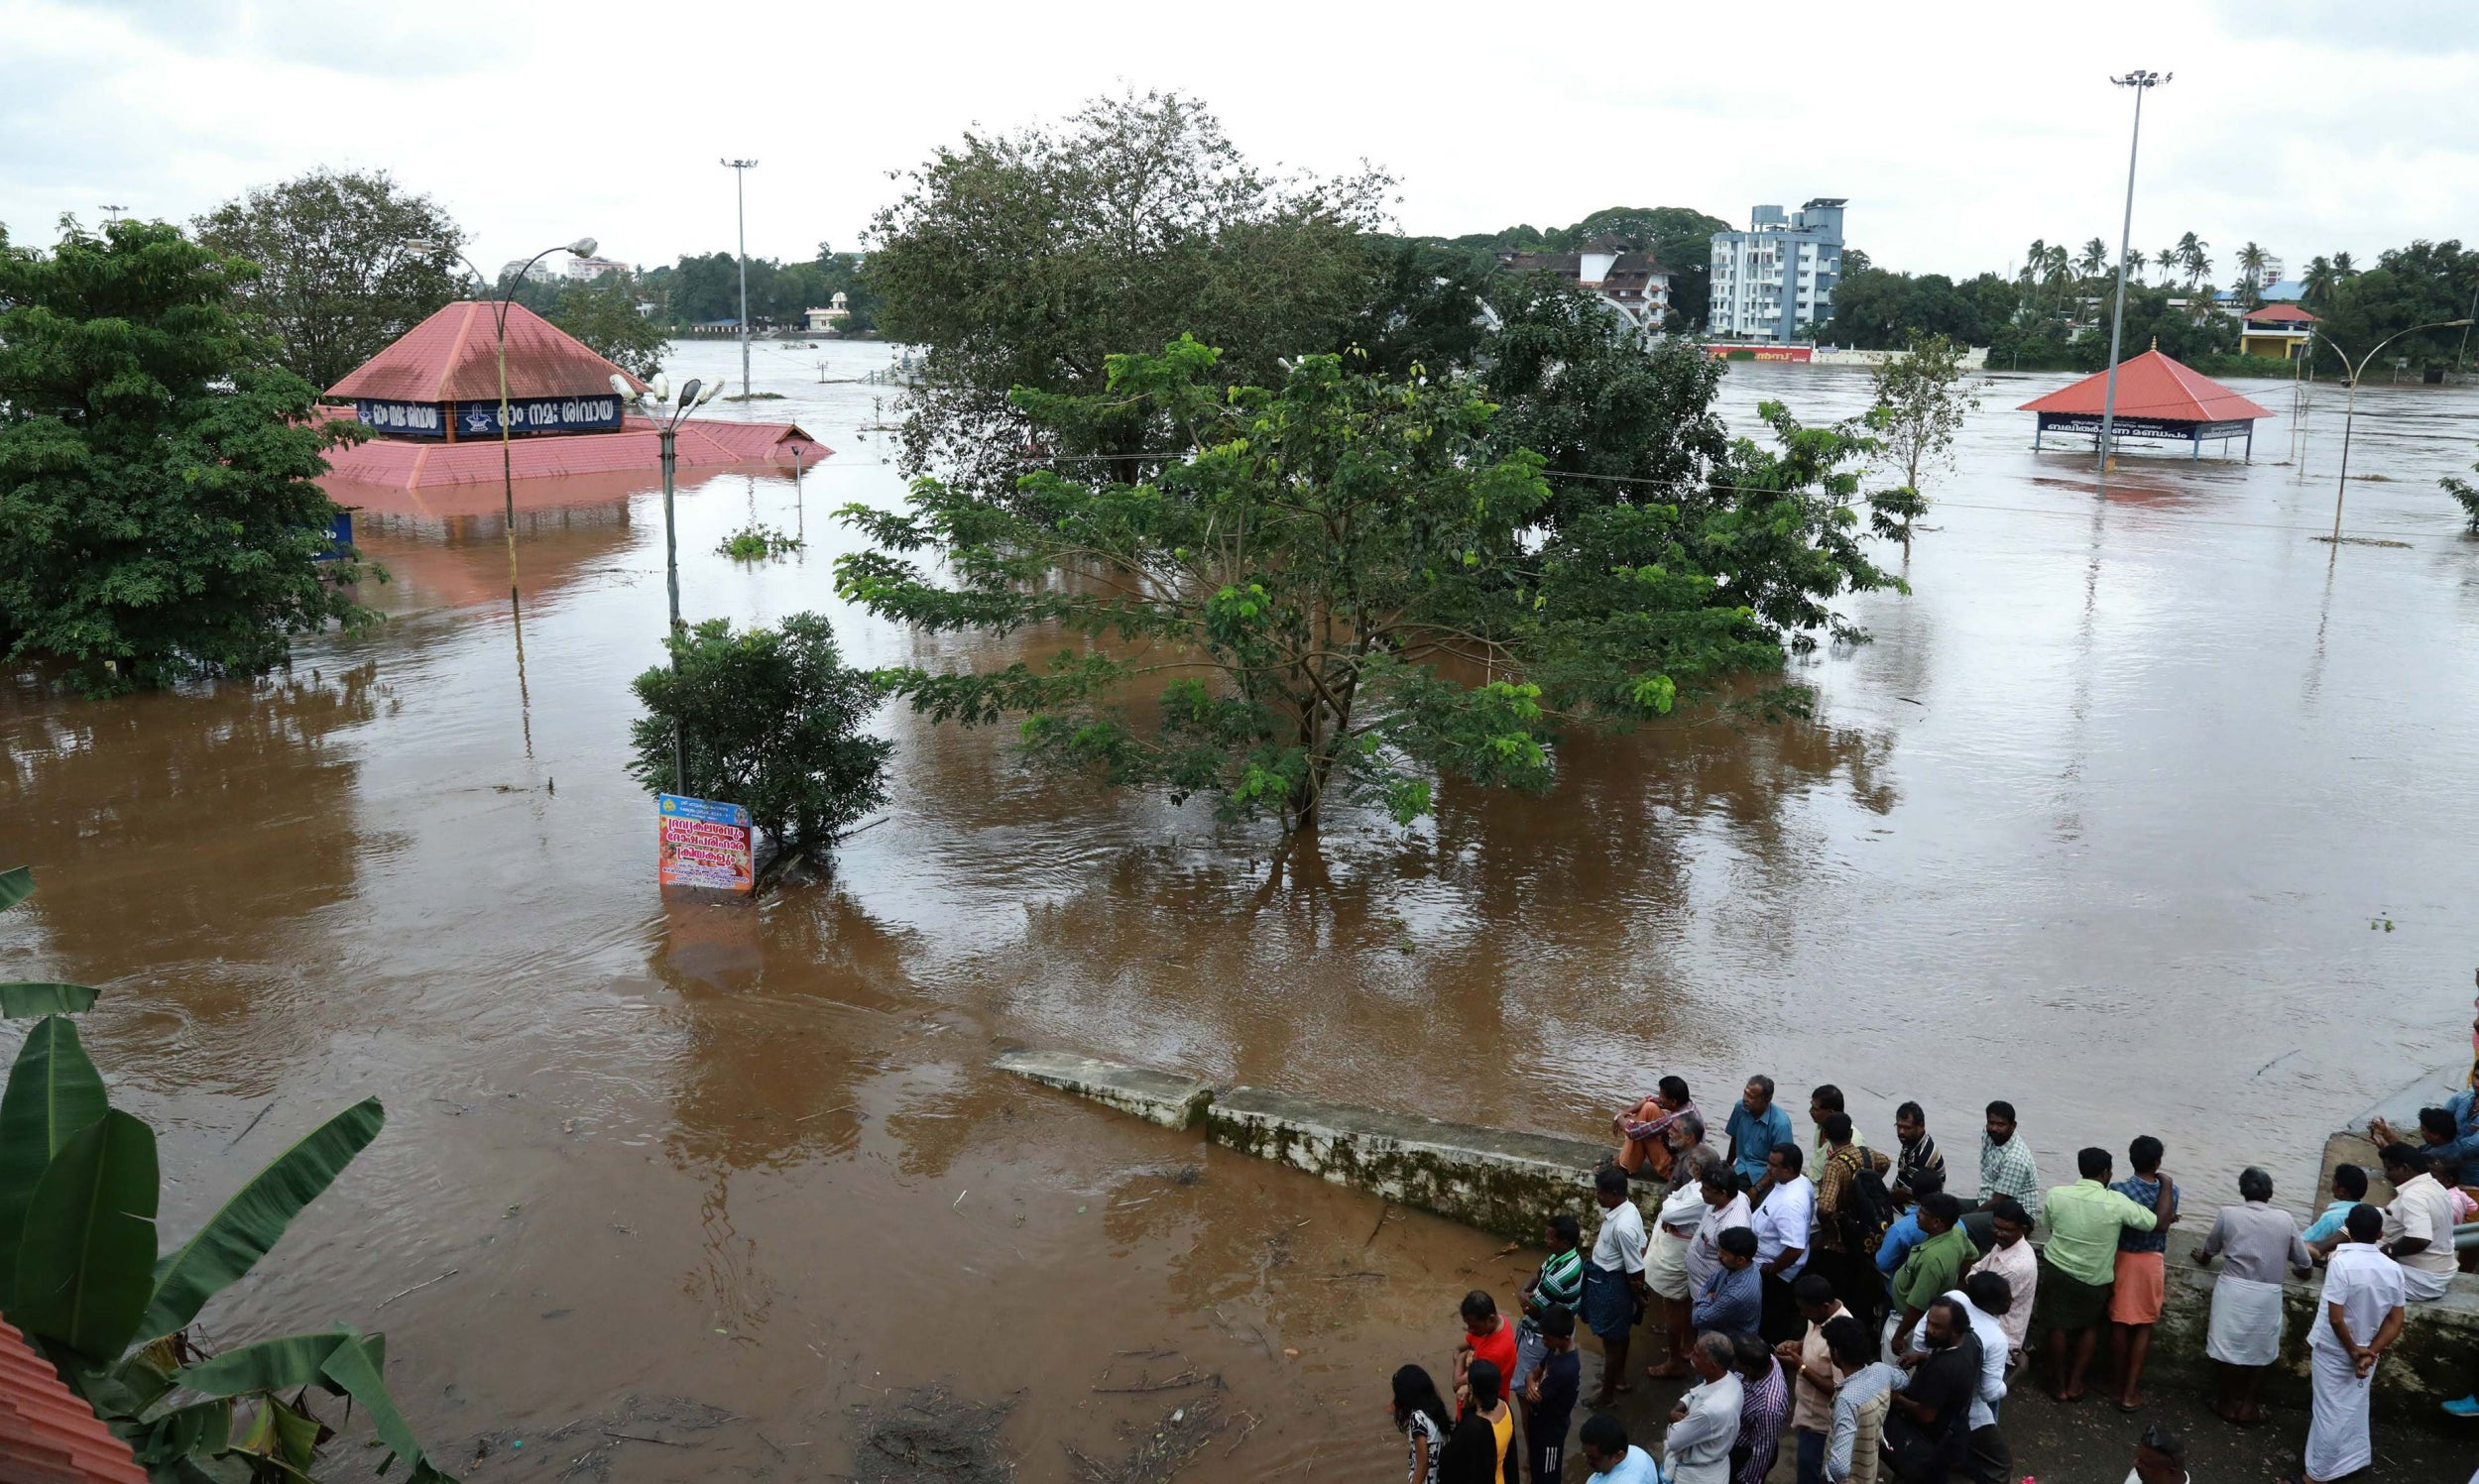 Kerala floods: More than 1m evacuated as fleet of civilian